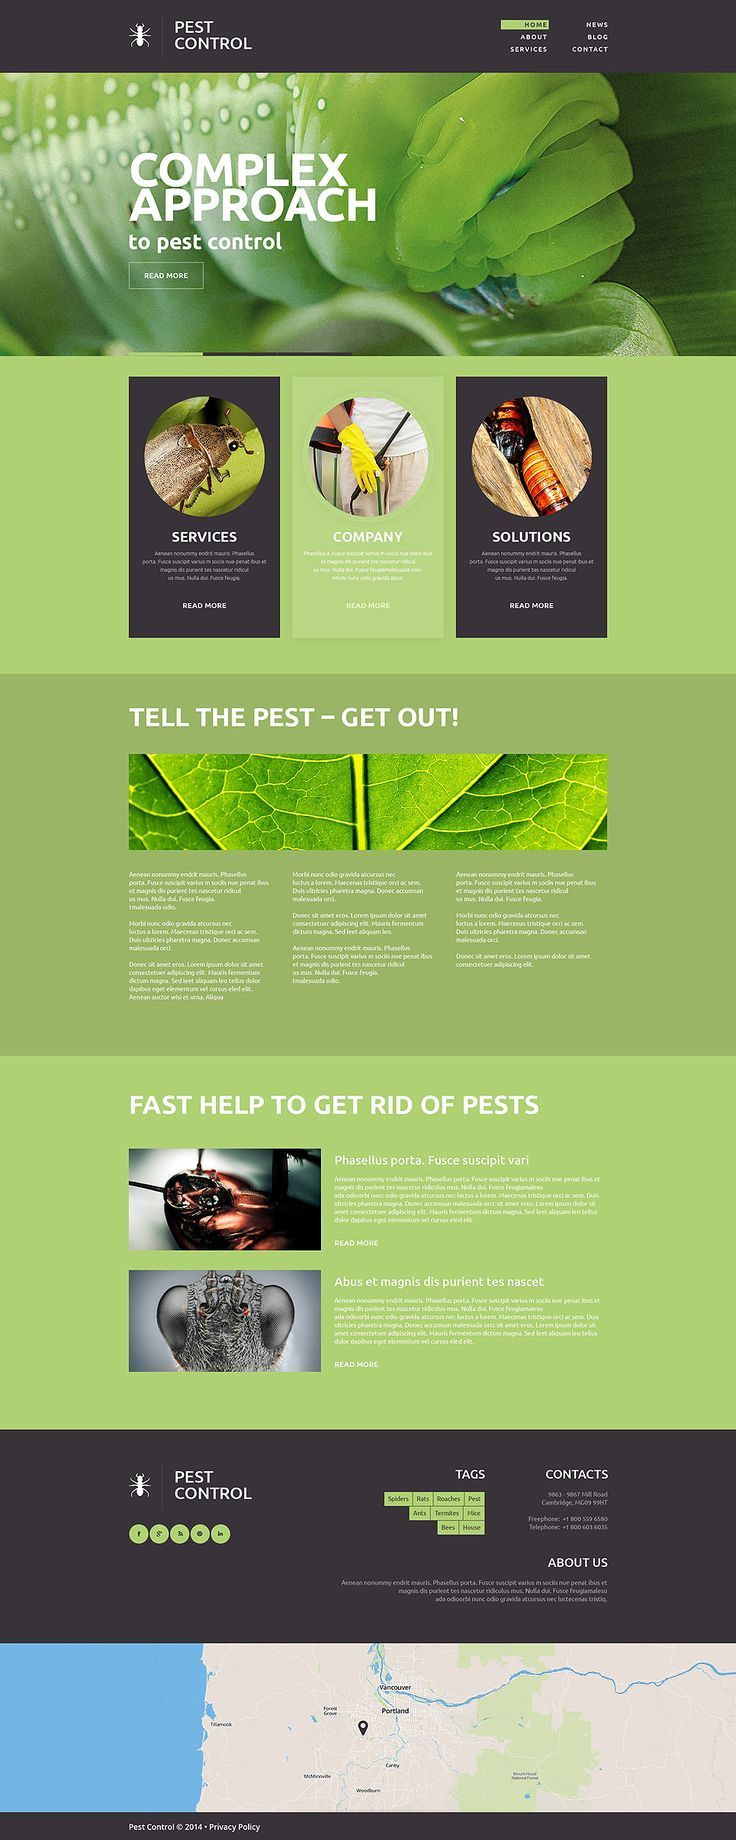 Pest Control Flyer Control Flyer Flyer Zur Schadlingsbekampfung Depliant Sur La Lutte Antiparasit In 2020 Web Layout Design Unique Web Design Creative Web Design